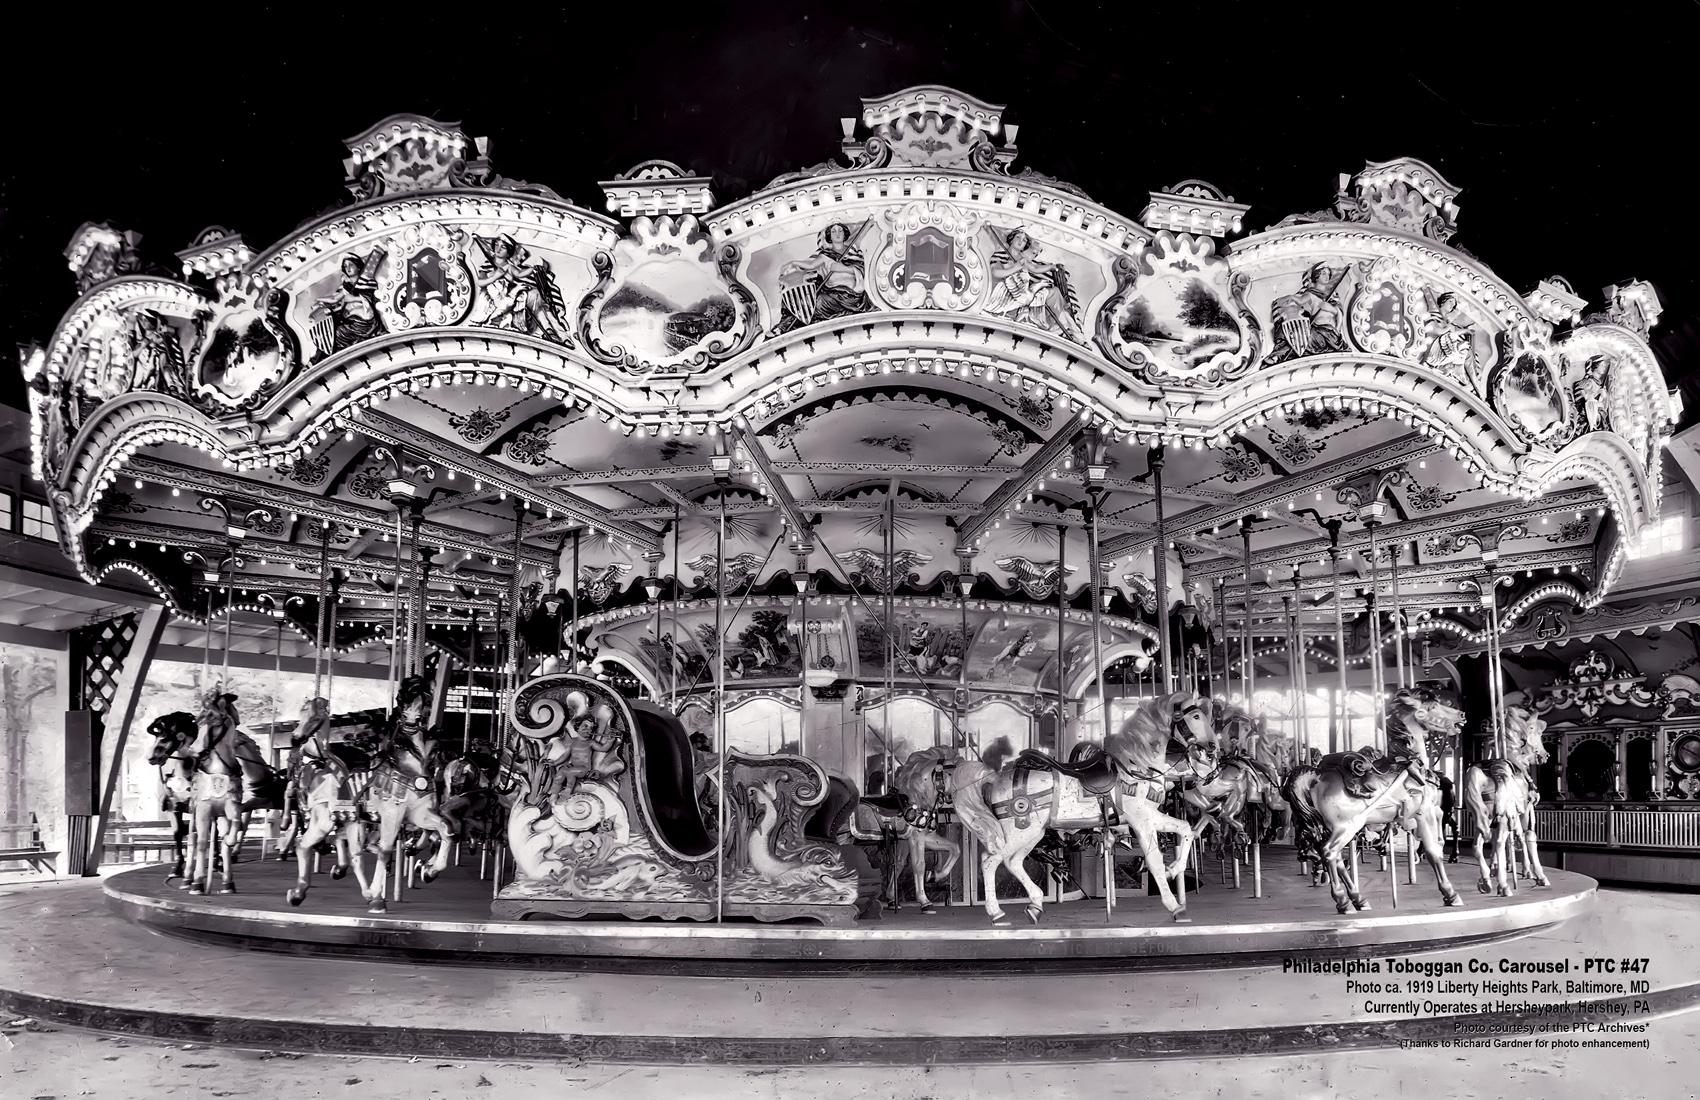 Hersheypark-PTC-47-carousel-PTC-Archive-CNT-center-Sept-12